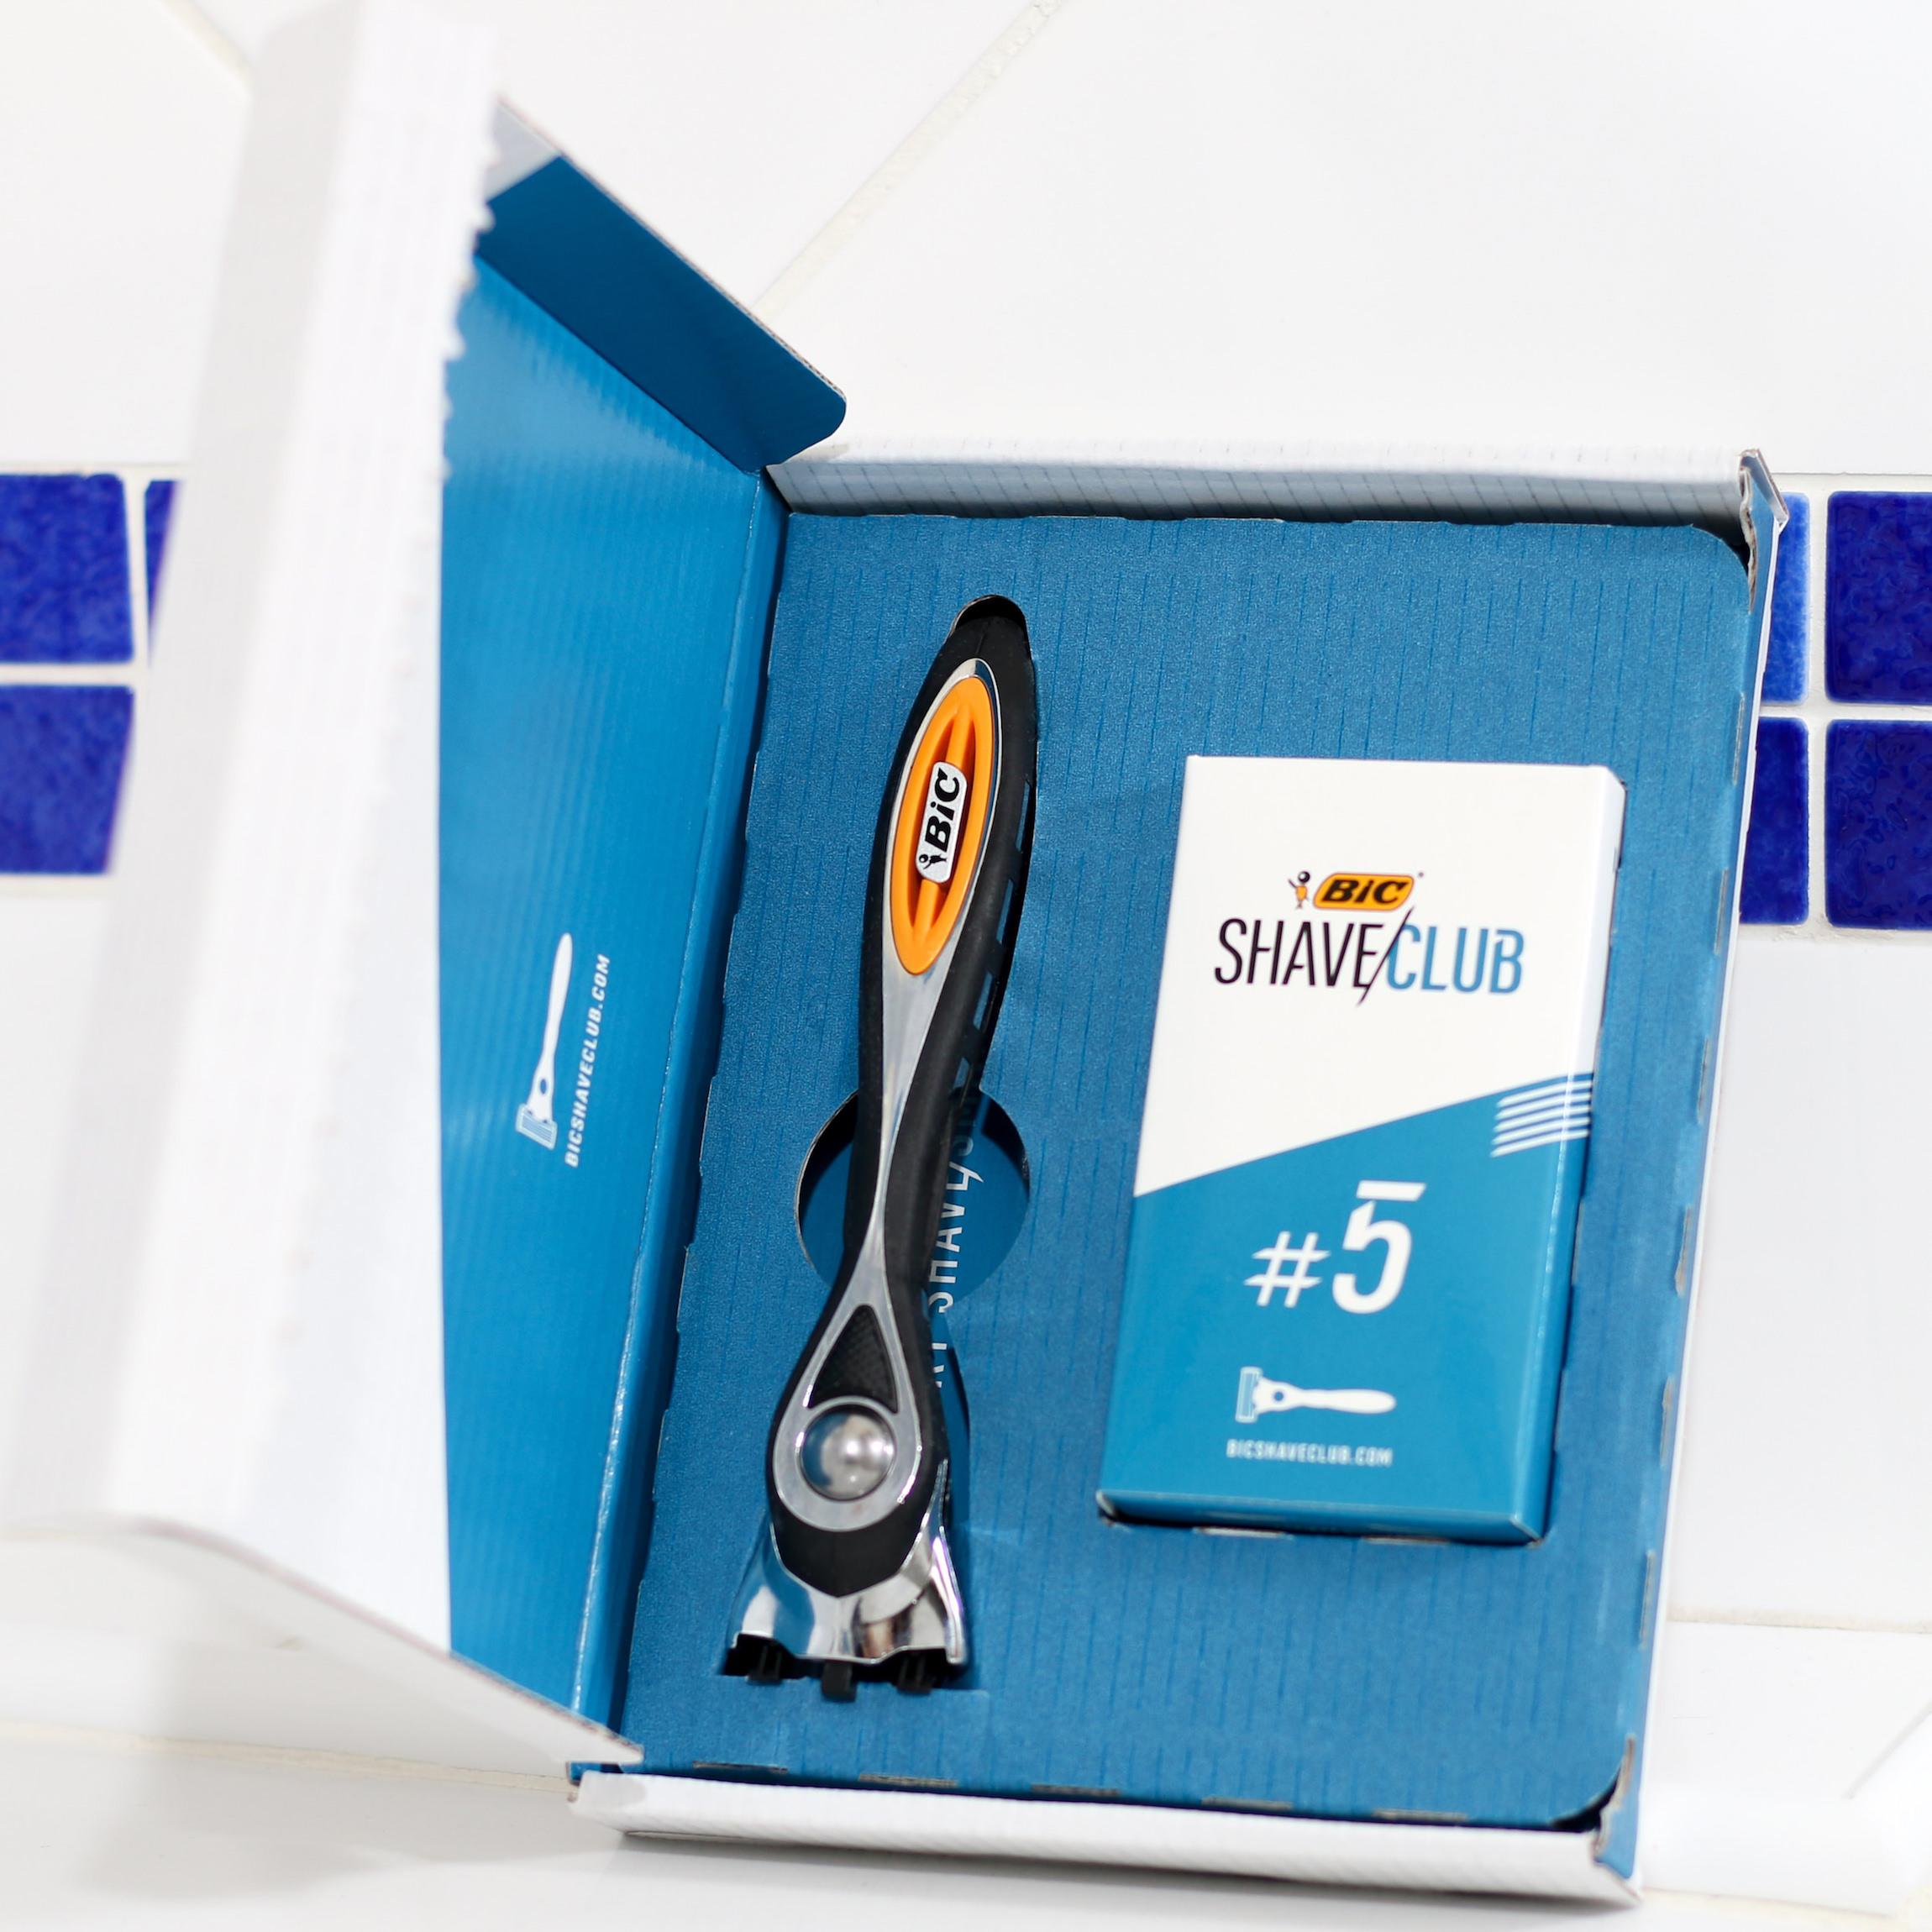 box bic shave club rasoir abonnement